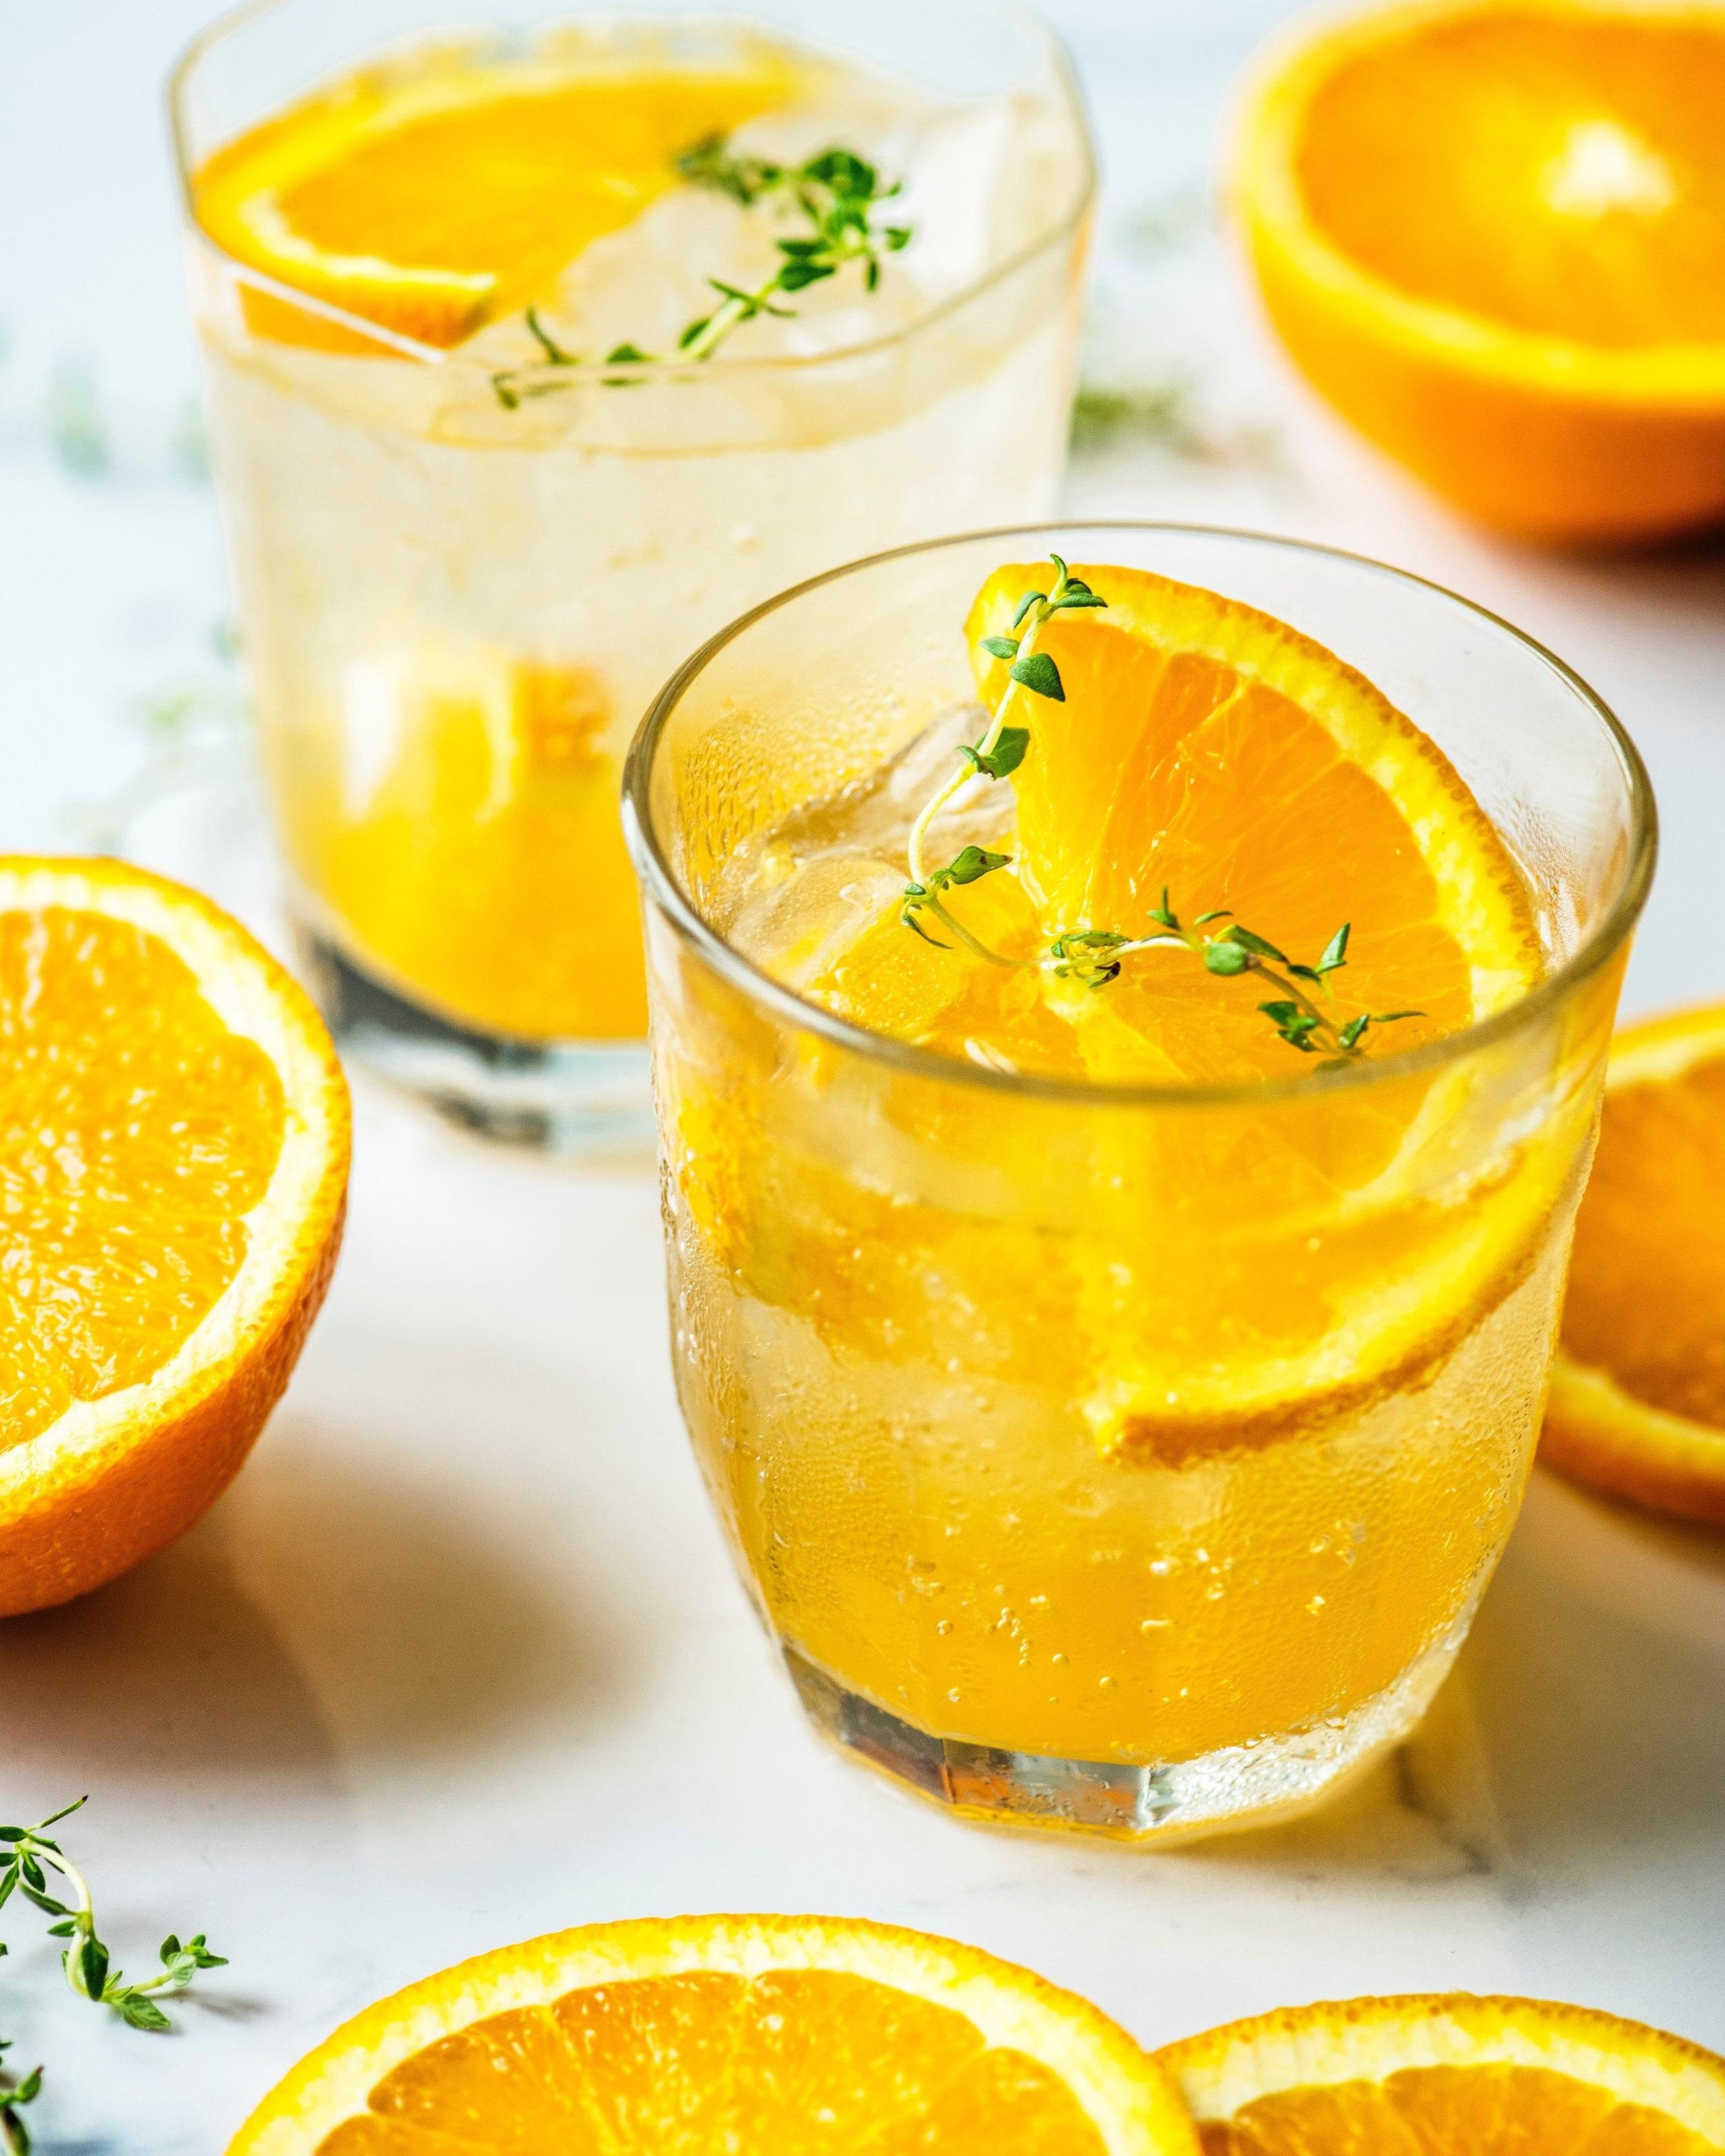 antioxidant-beneficial-beverage-1282174.jpg